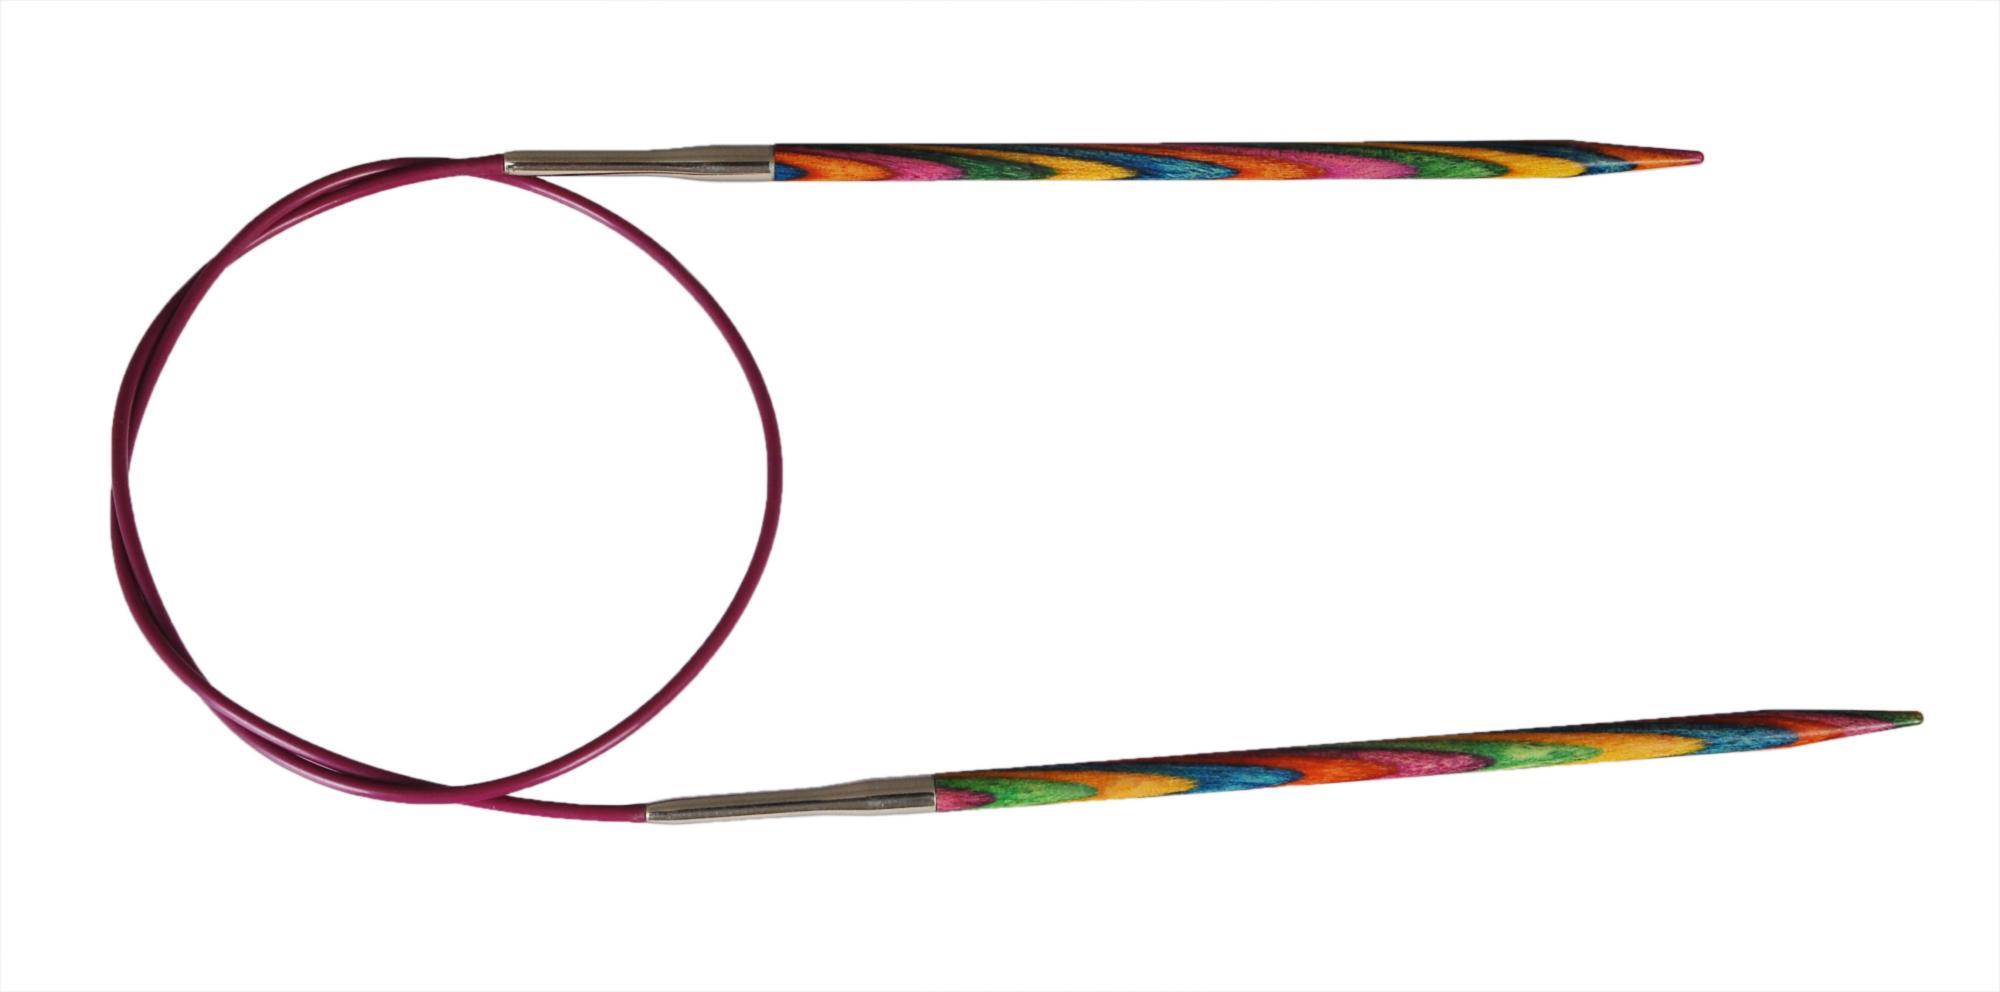 Спицы круговые 60 см Symfonie Wood KnitPro, 21329, 8.00 мм